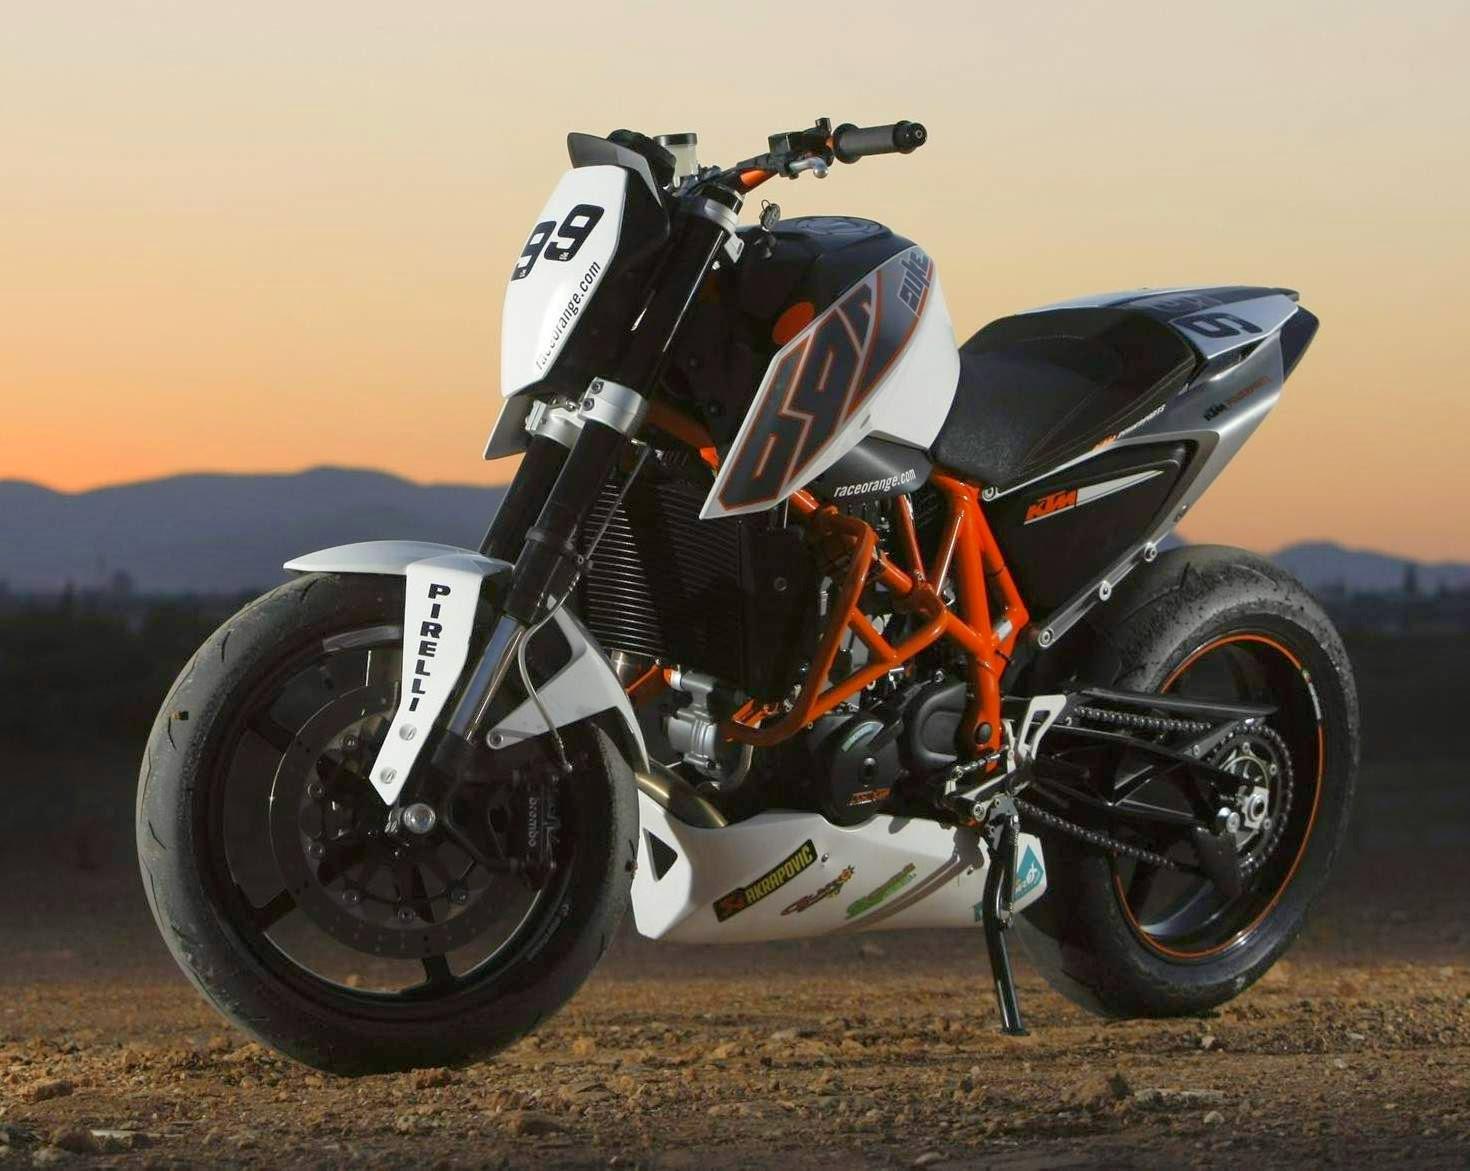 Duke Bike Wallpaper: Bike & Cars HD Wallpapers: KTM 690 Duke ABS Motorcycle HD